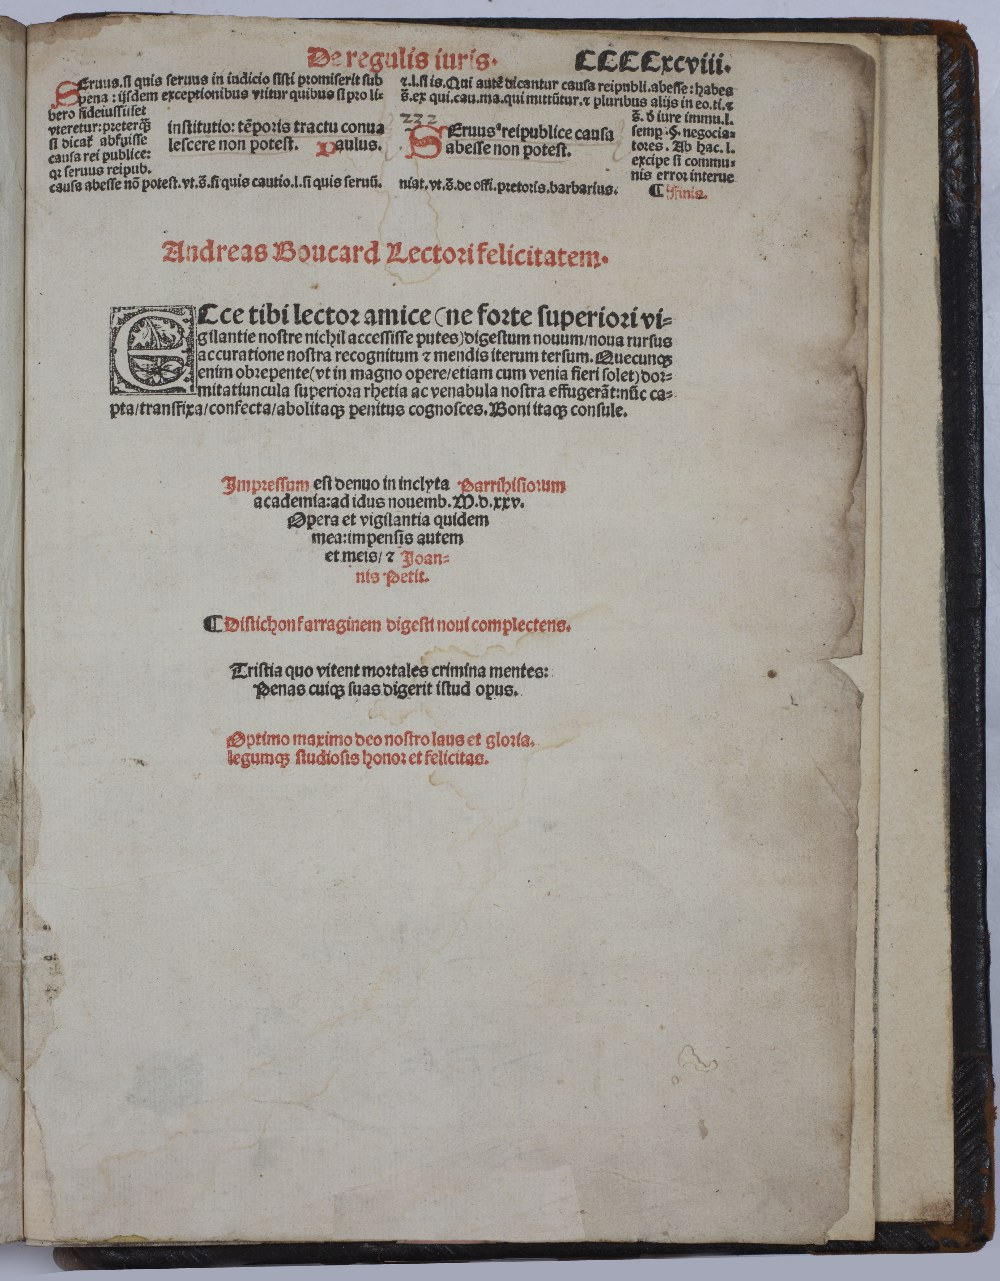 BOUCARD, ANDREAS (Ed.), Justinian, Digestorum Seu Pandectar, Joannis Petit, Paris 1525. 12 books - Image 4 of 5